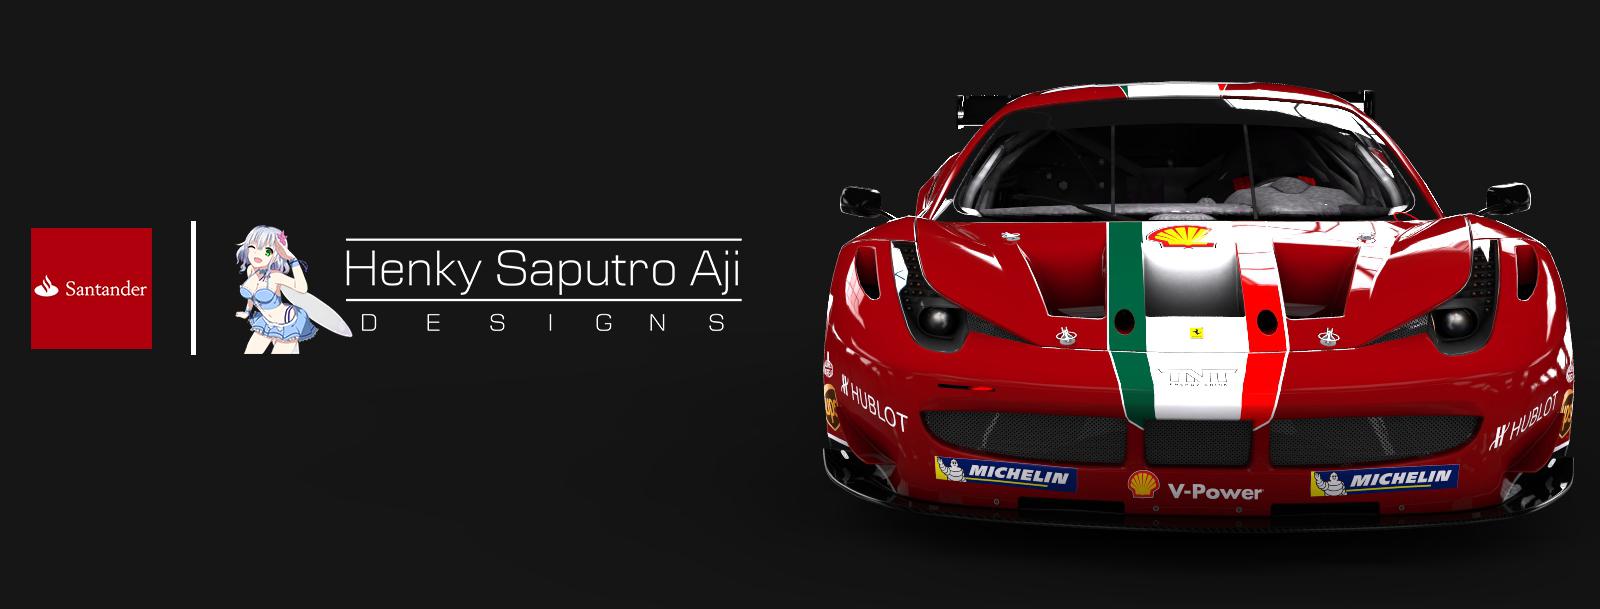 ferrari 458 GT2.87.jpg